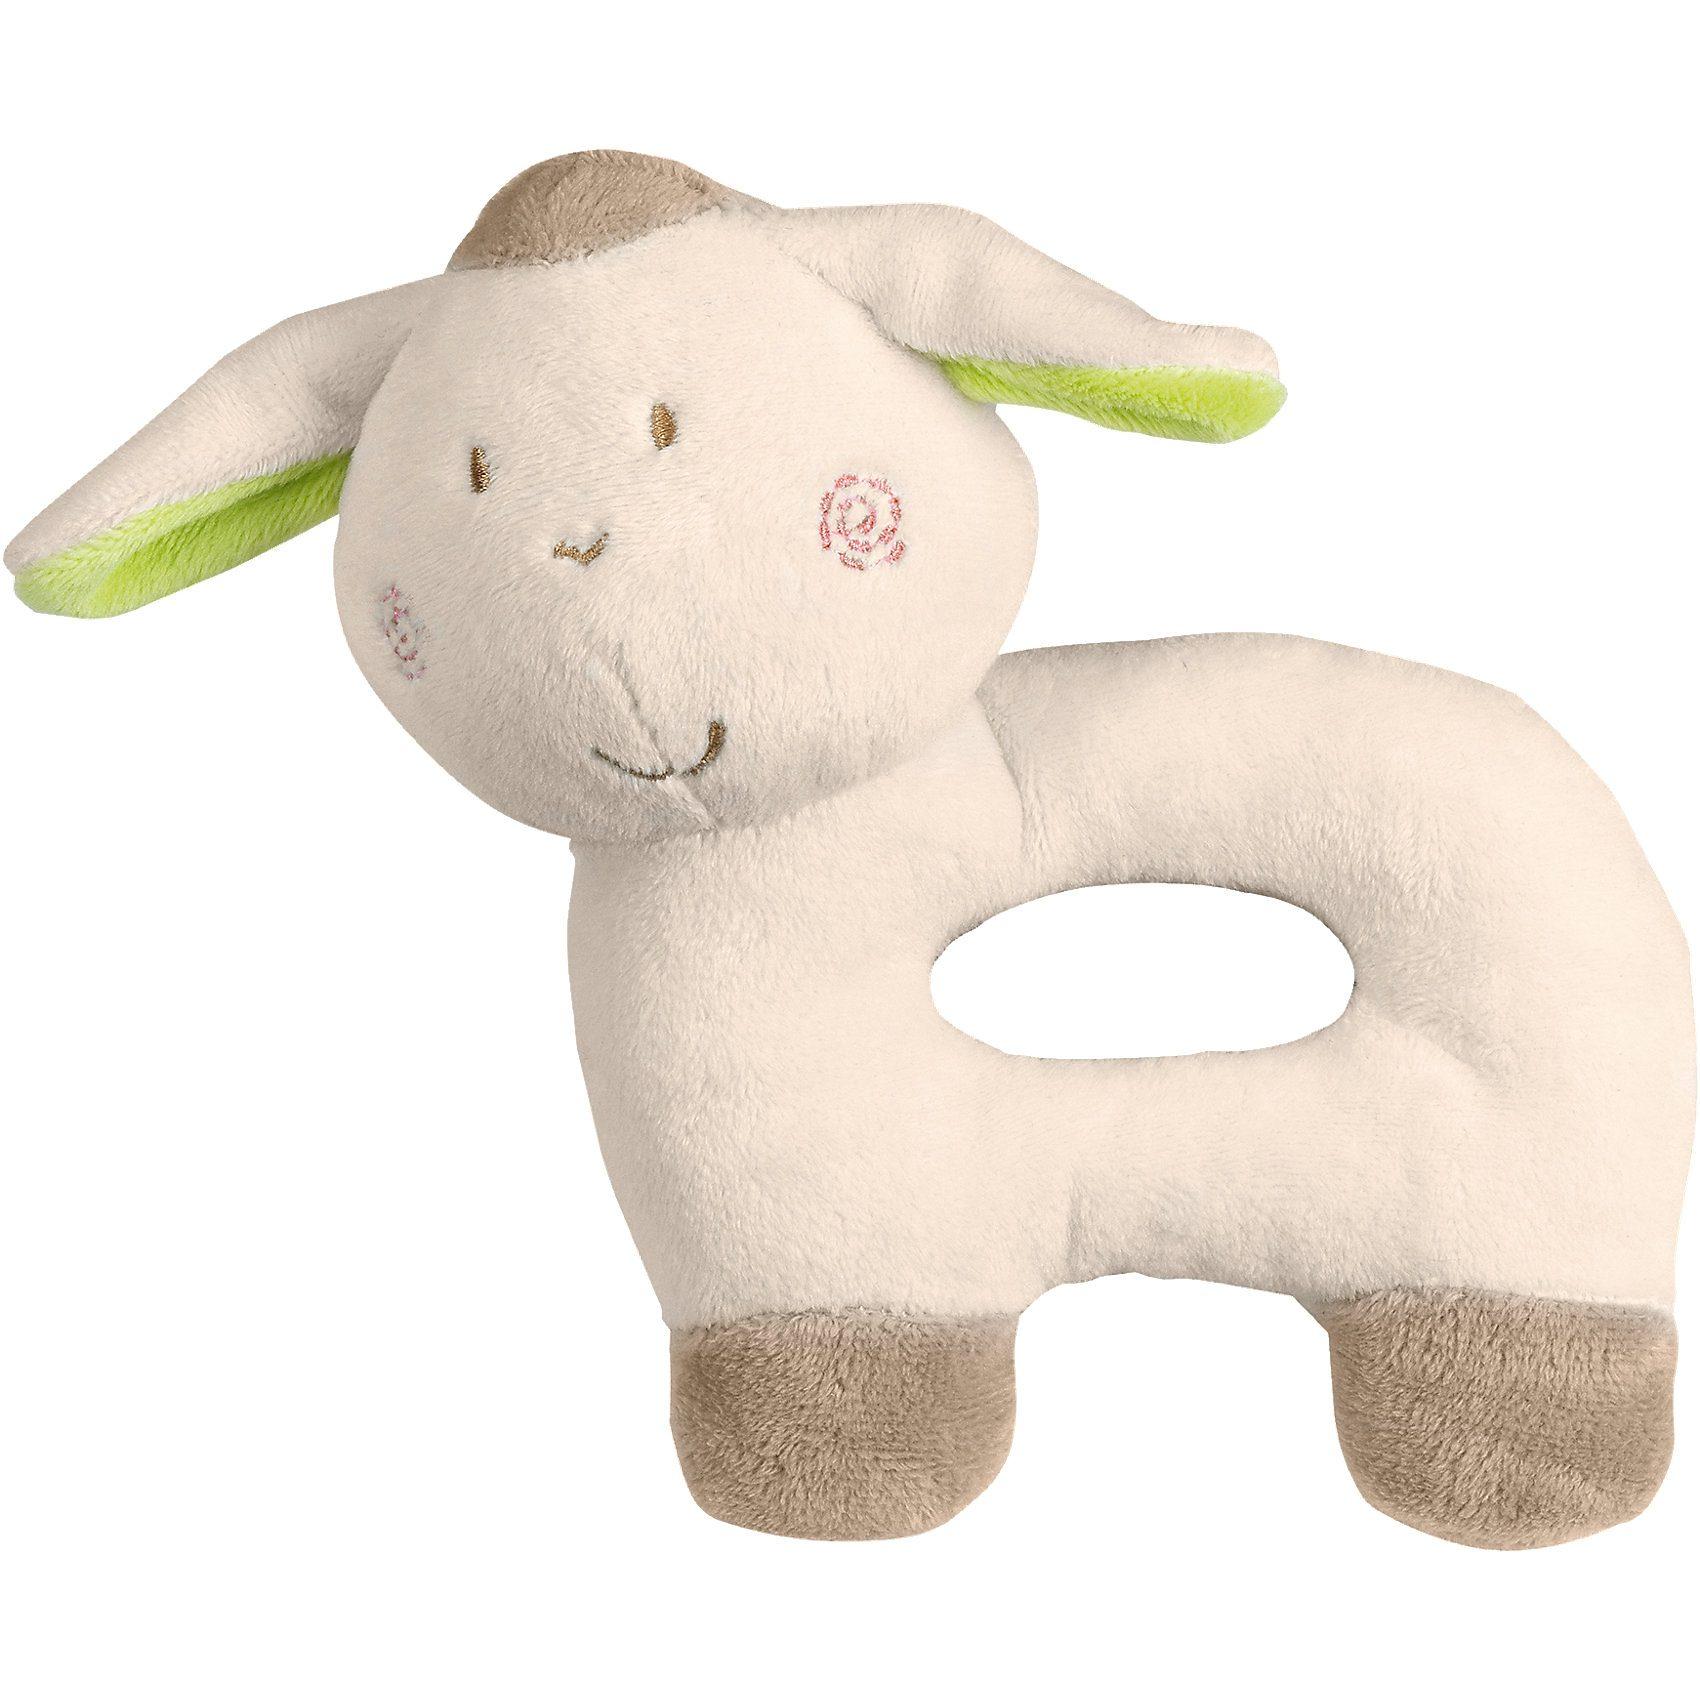 fashy Plüsch-Greifling Lamm mit Rassel